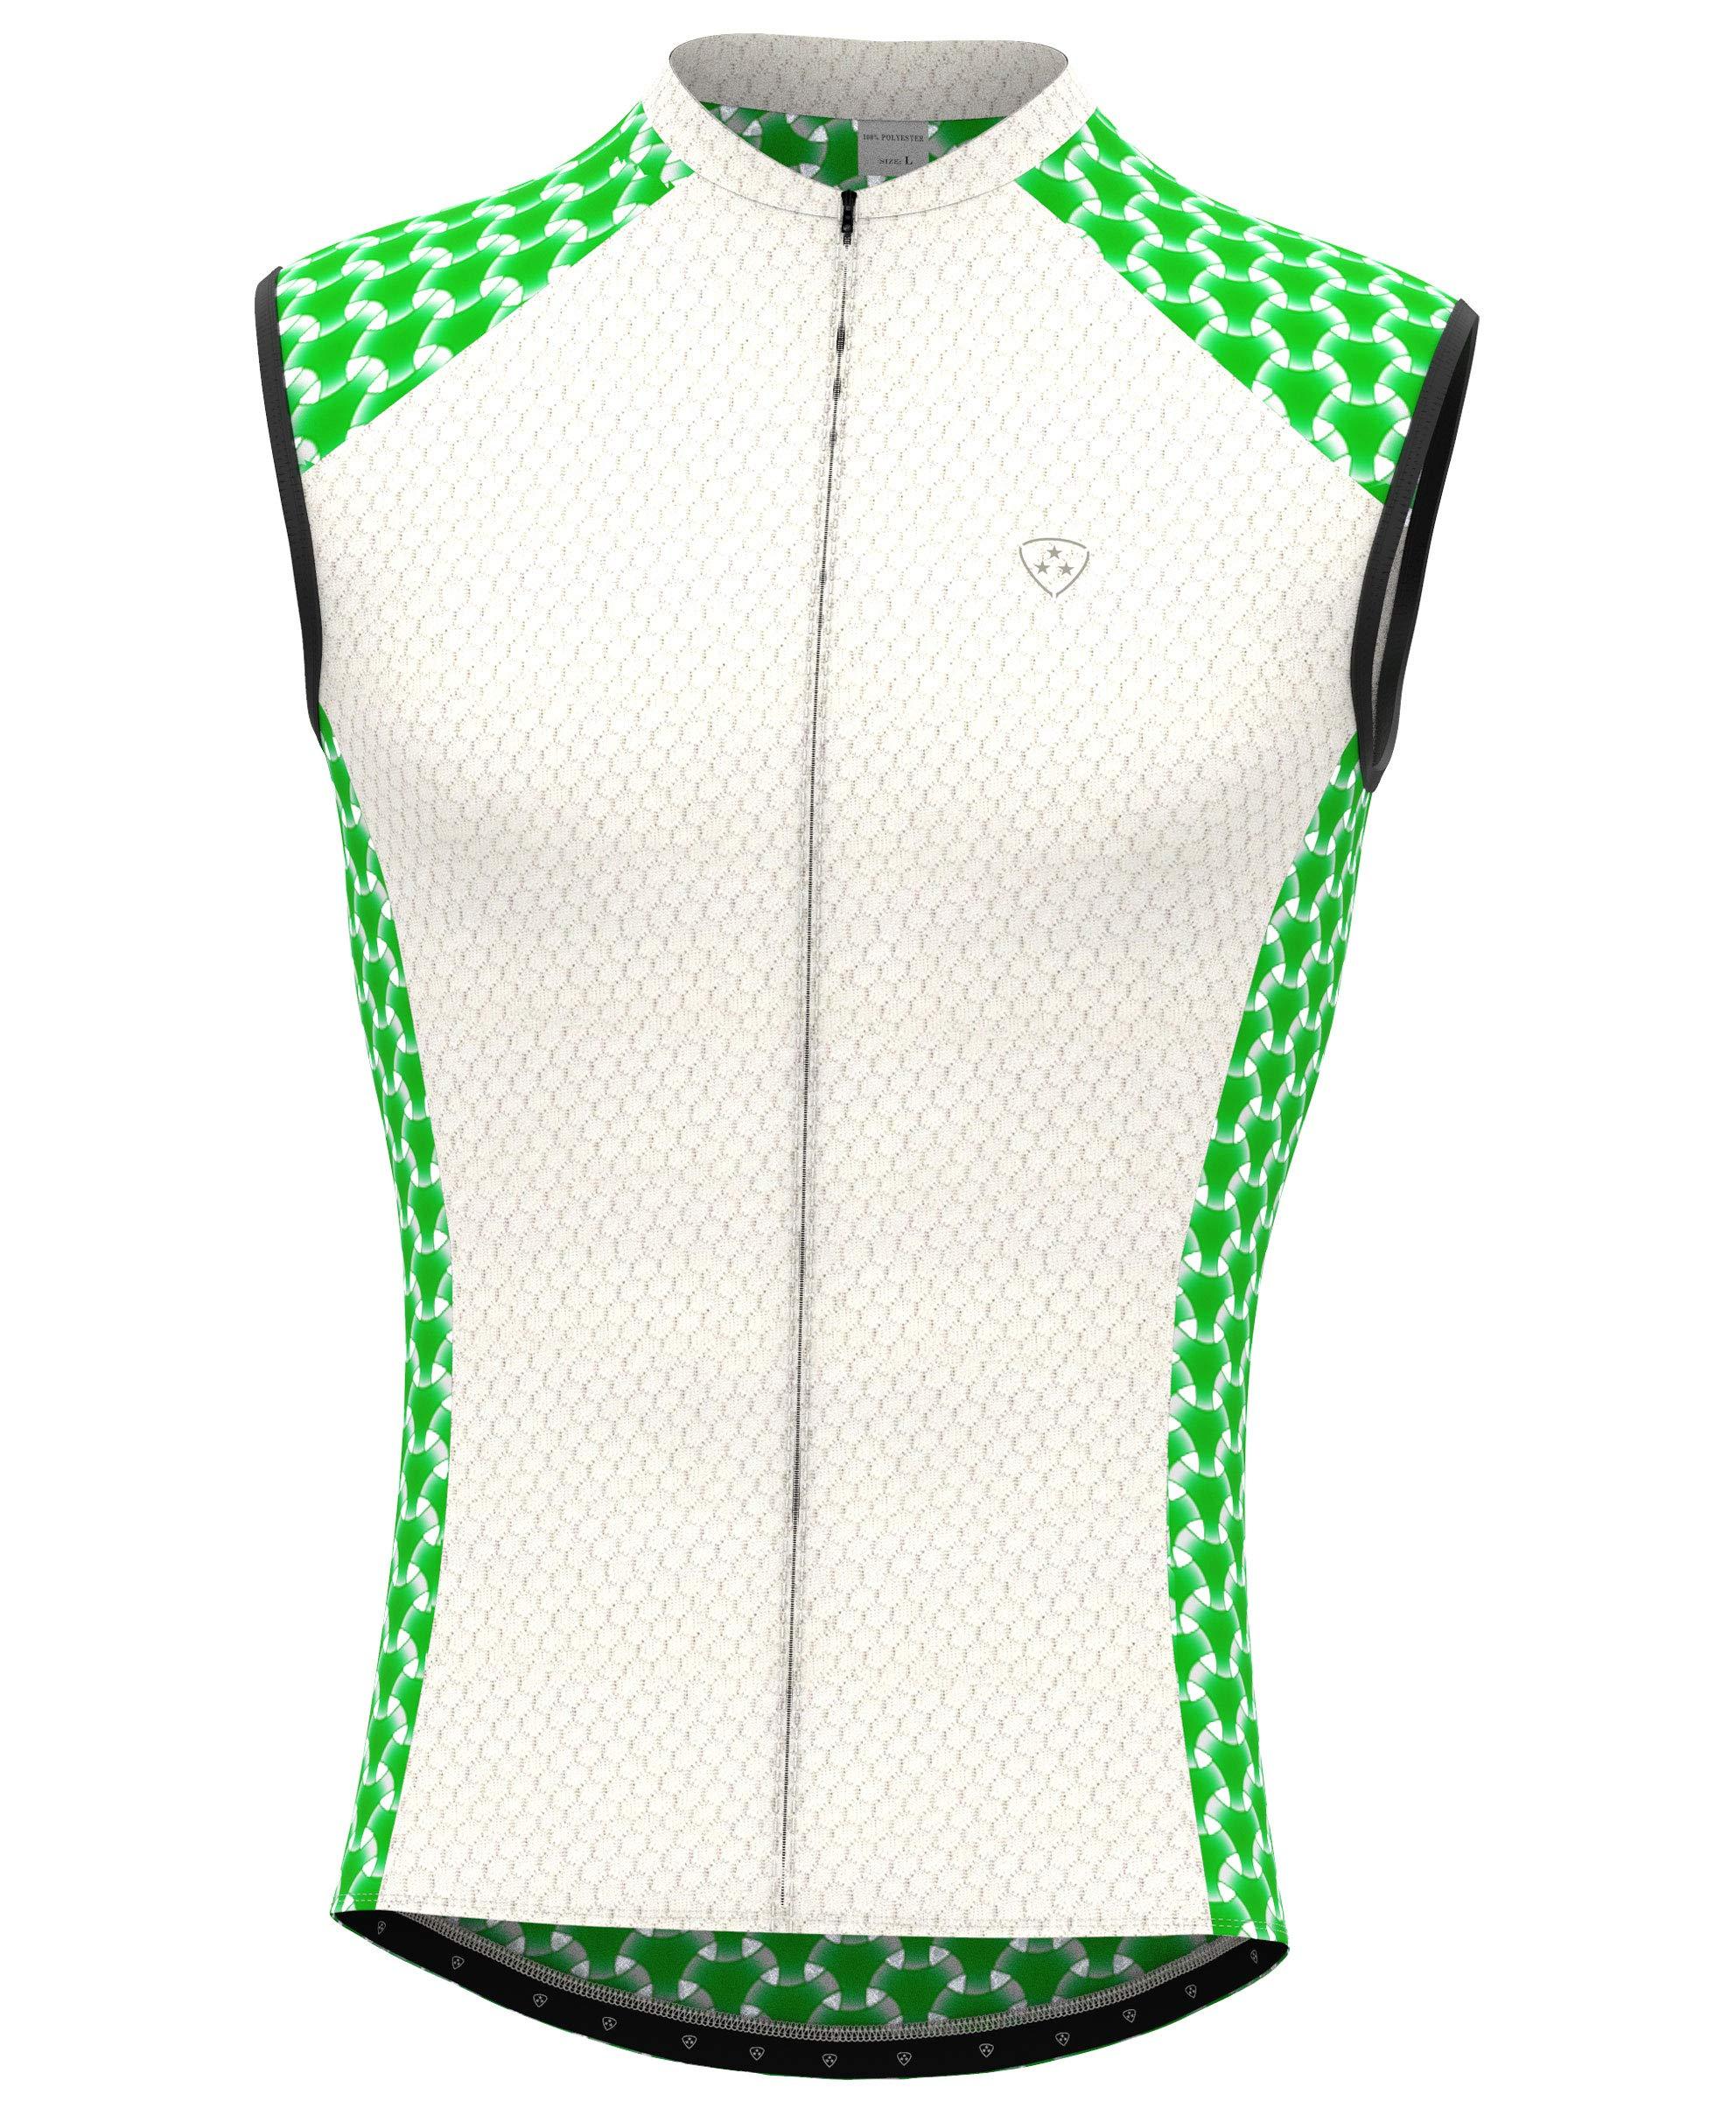 Deportes Hera Ropa Ciclismo Maillot sin Manga Spinning Carretera ...